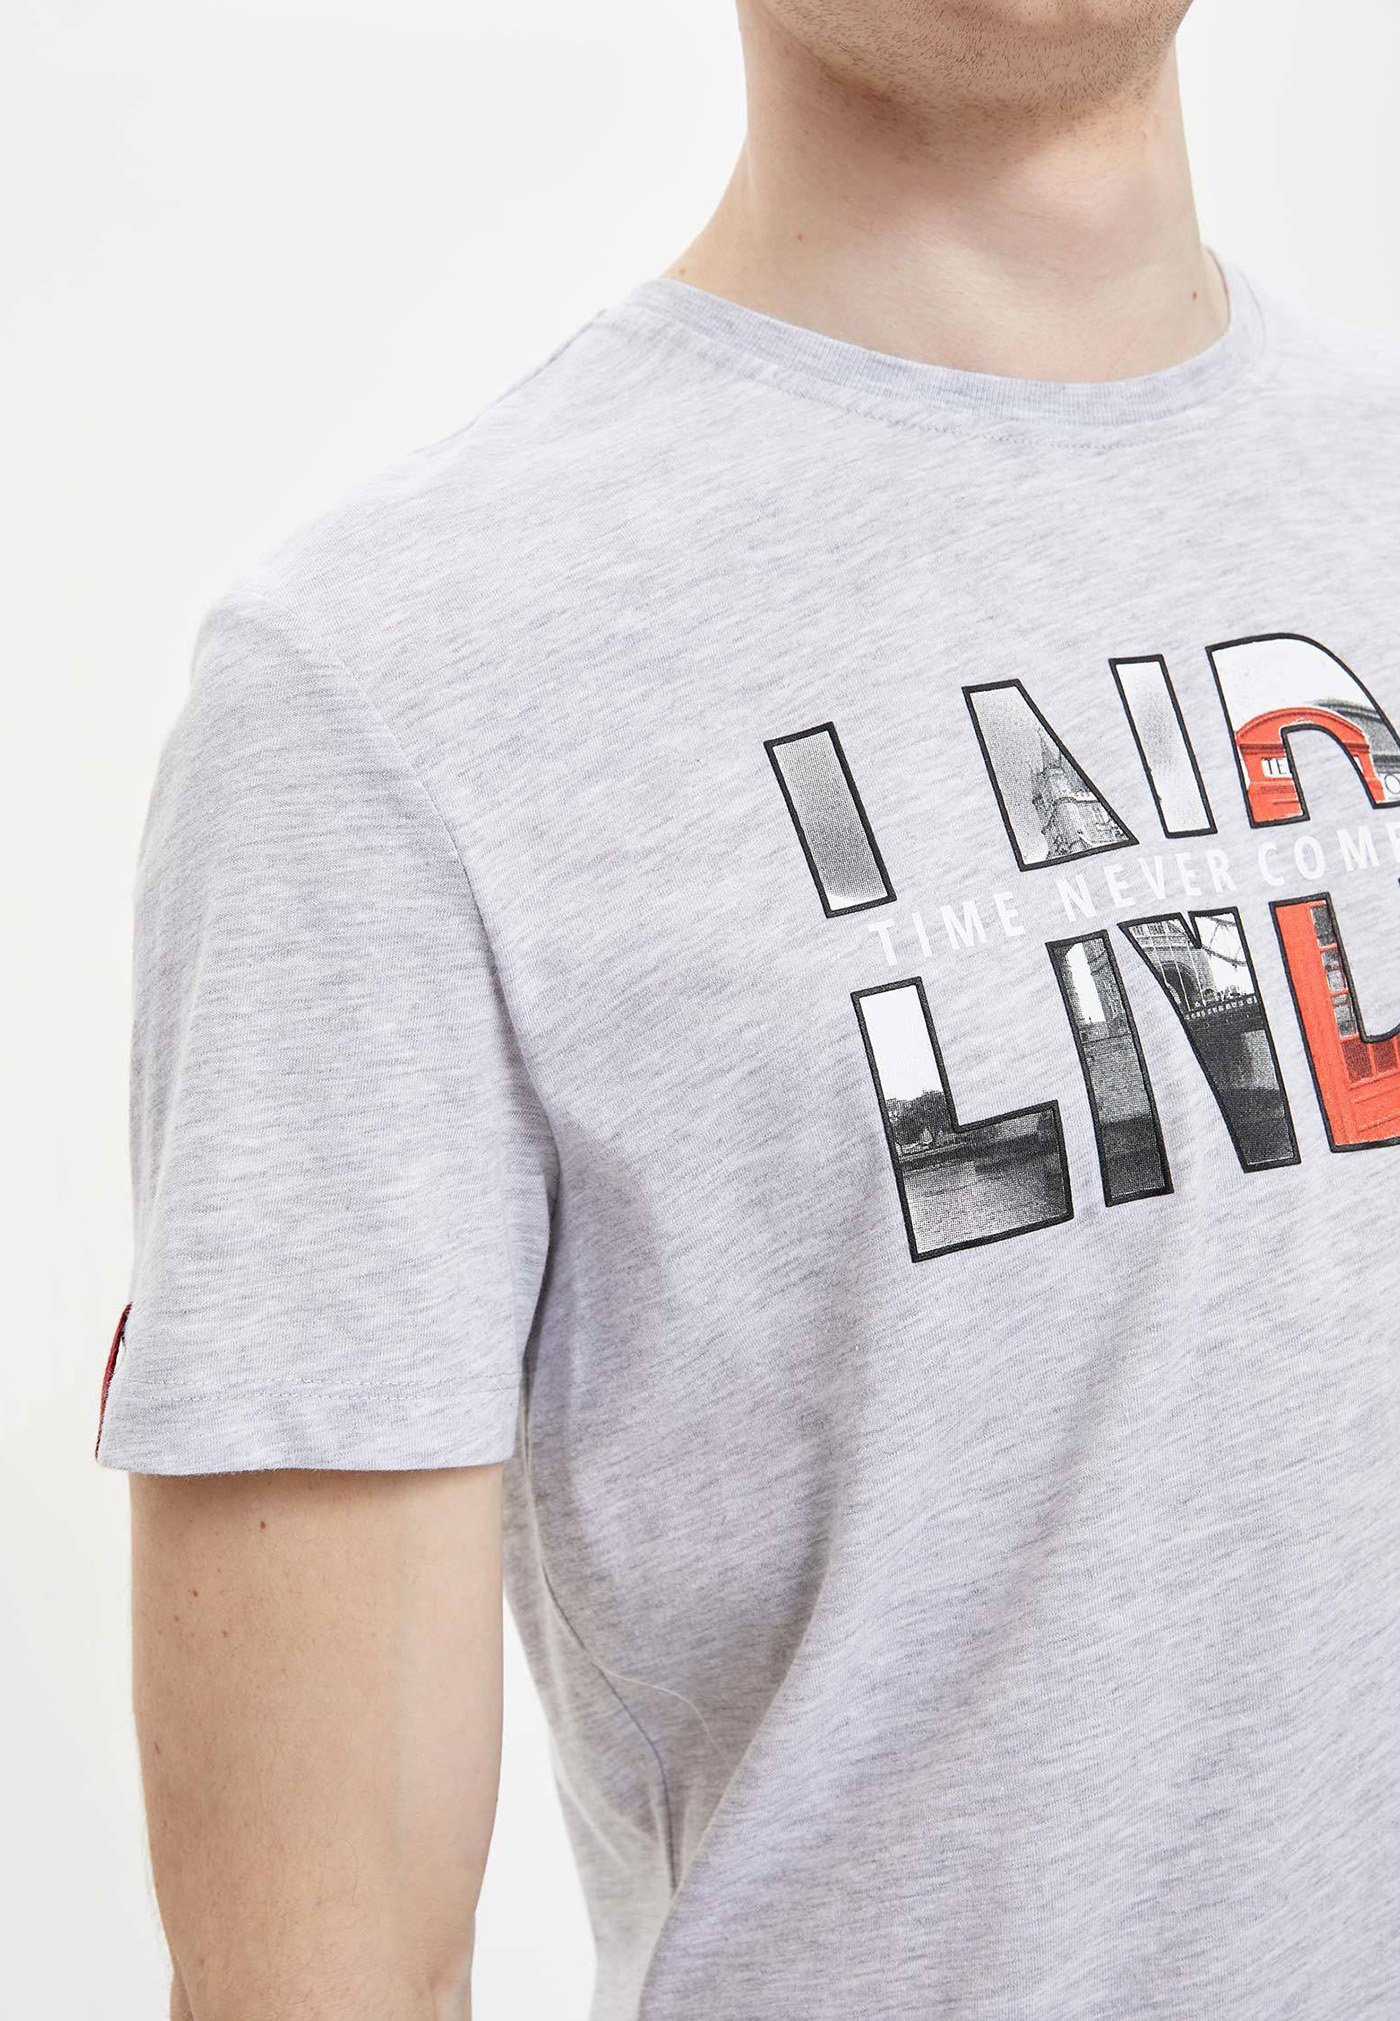 DeFacto Print T-shirt - grey GTDbH